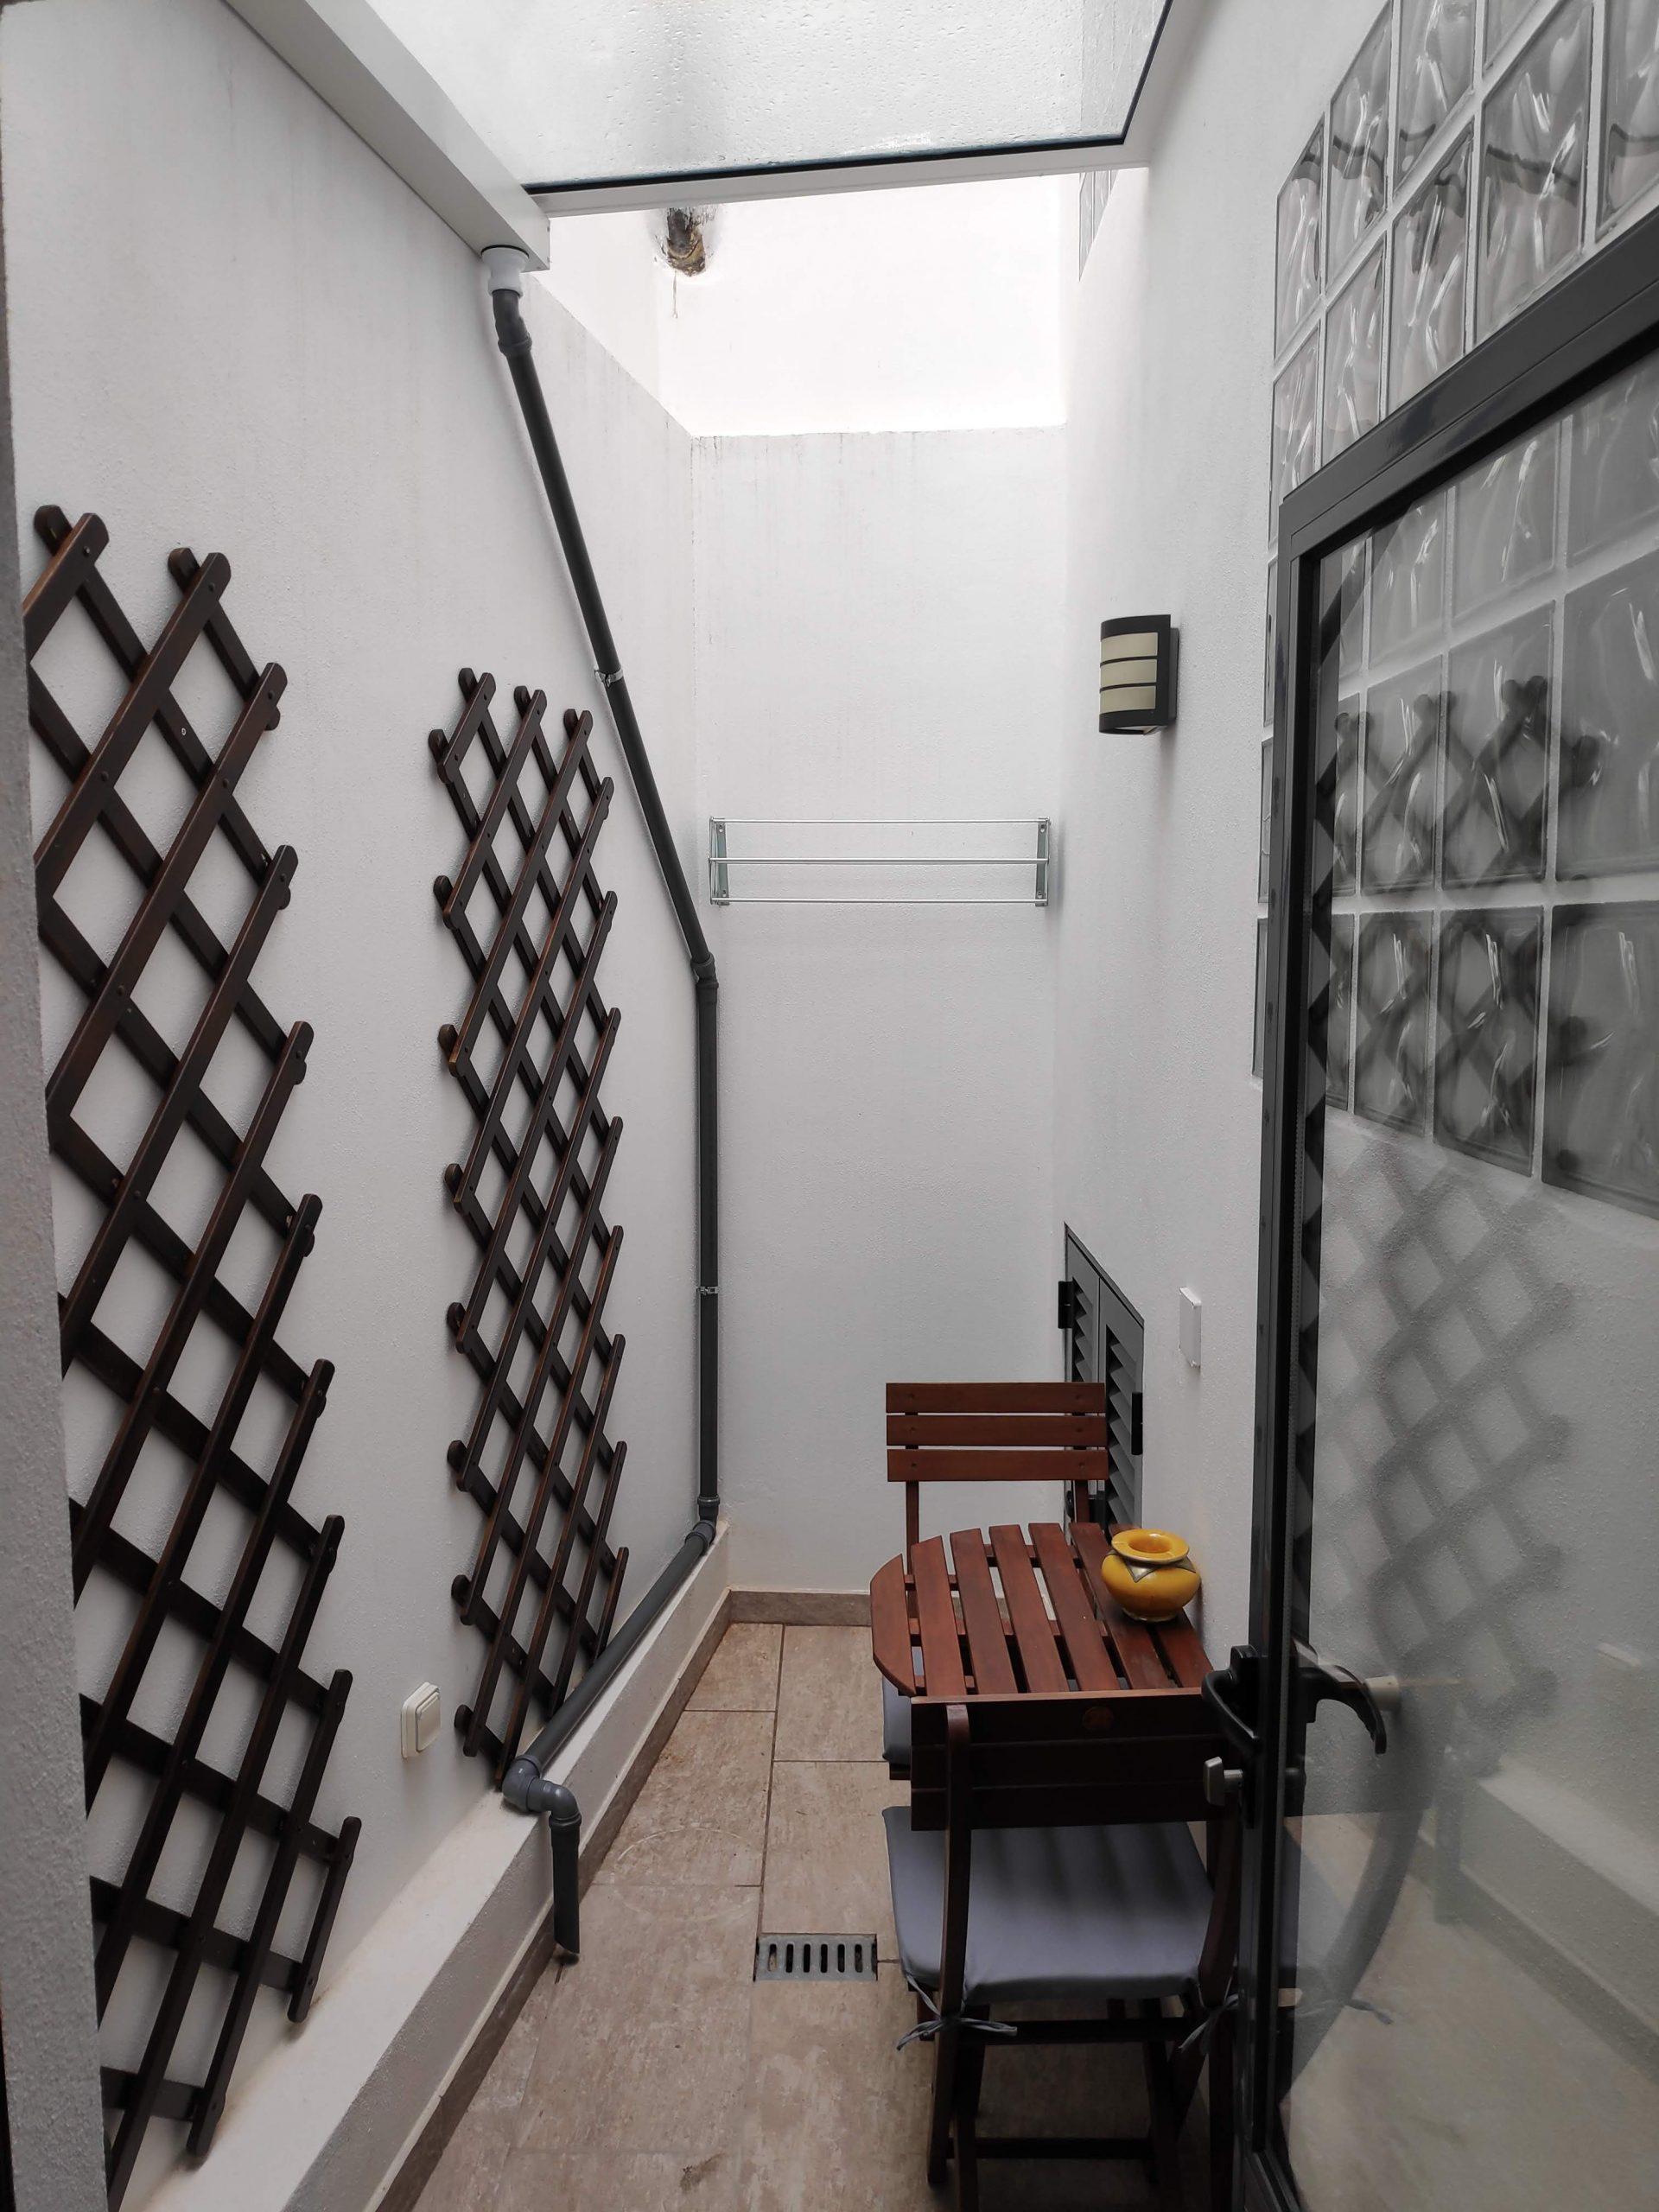 Location appartements et villas de vacance, The Old Town House & Rooftop à Faro, Portugal Algarve, REF_IMG_14267_17713